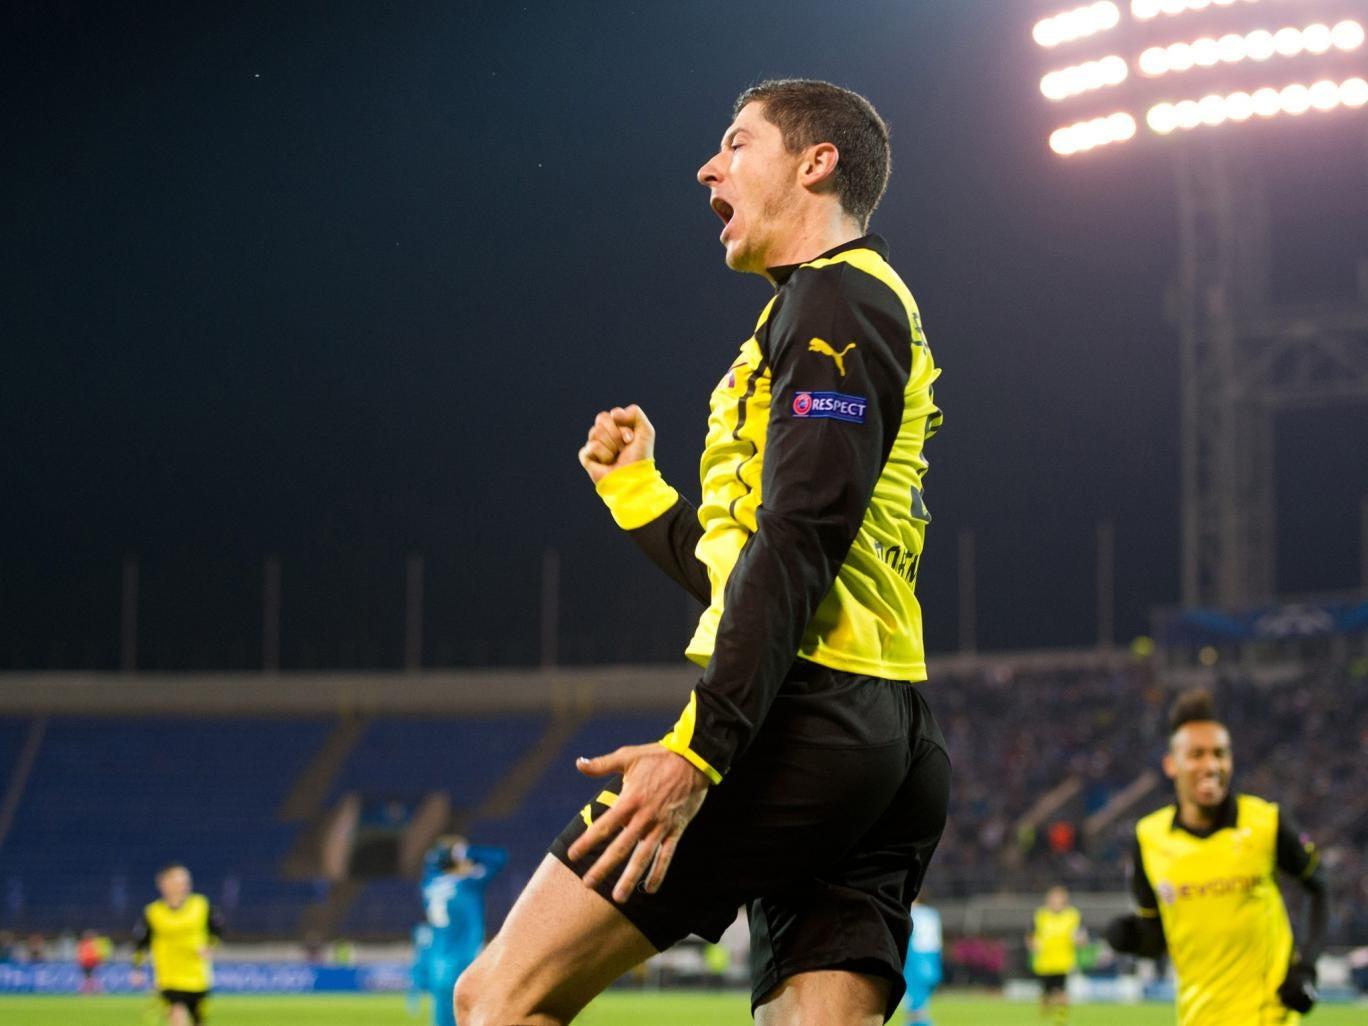 Borussia Dortmund's Robert Lewandowski celebrates after scoring a goal against Zenit Saint Petersburg during their UEFA Champions League Champions League last 16, first-leg football match